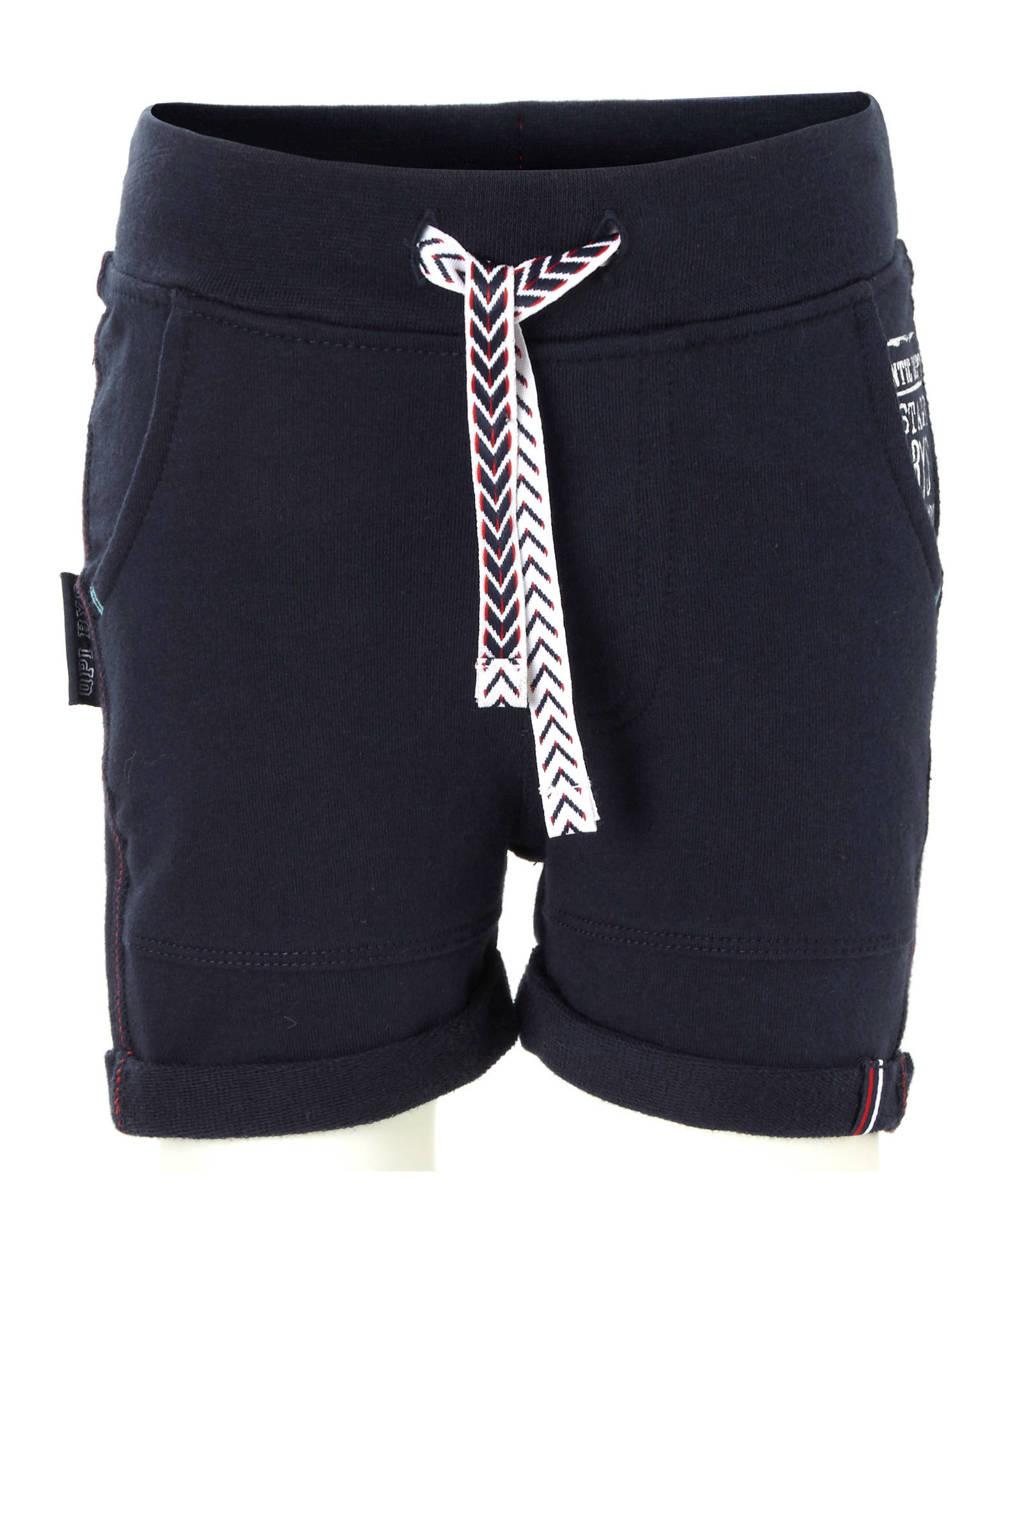 Quapi baby sweatshort Robbin met printopdruk donkerblauw, Donkerblauw